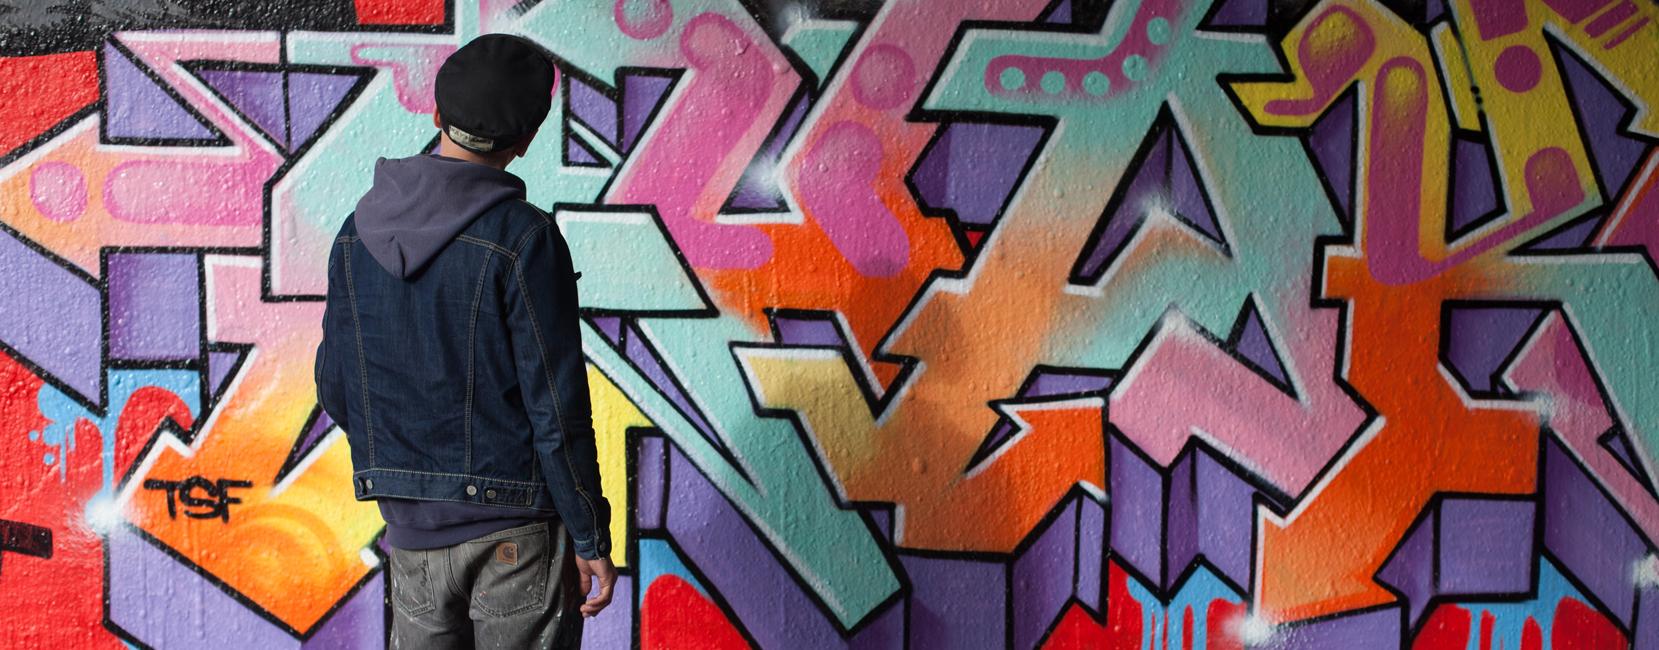 Graffiti Artist 'Shake'